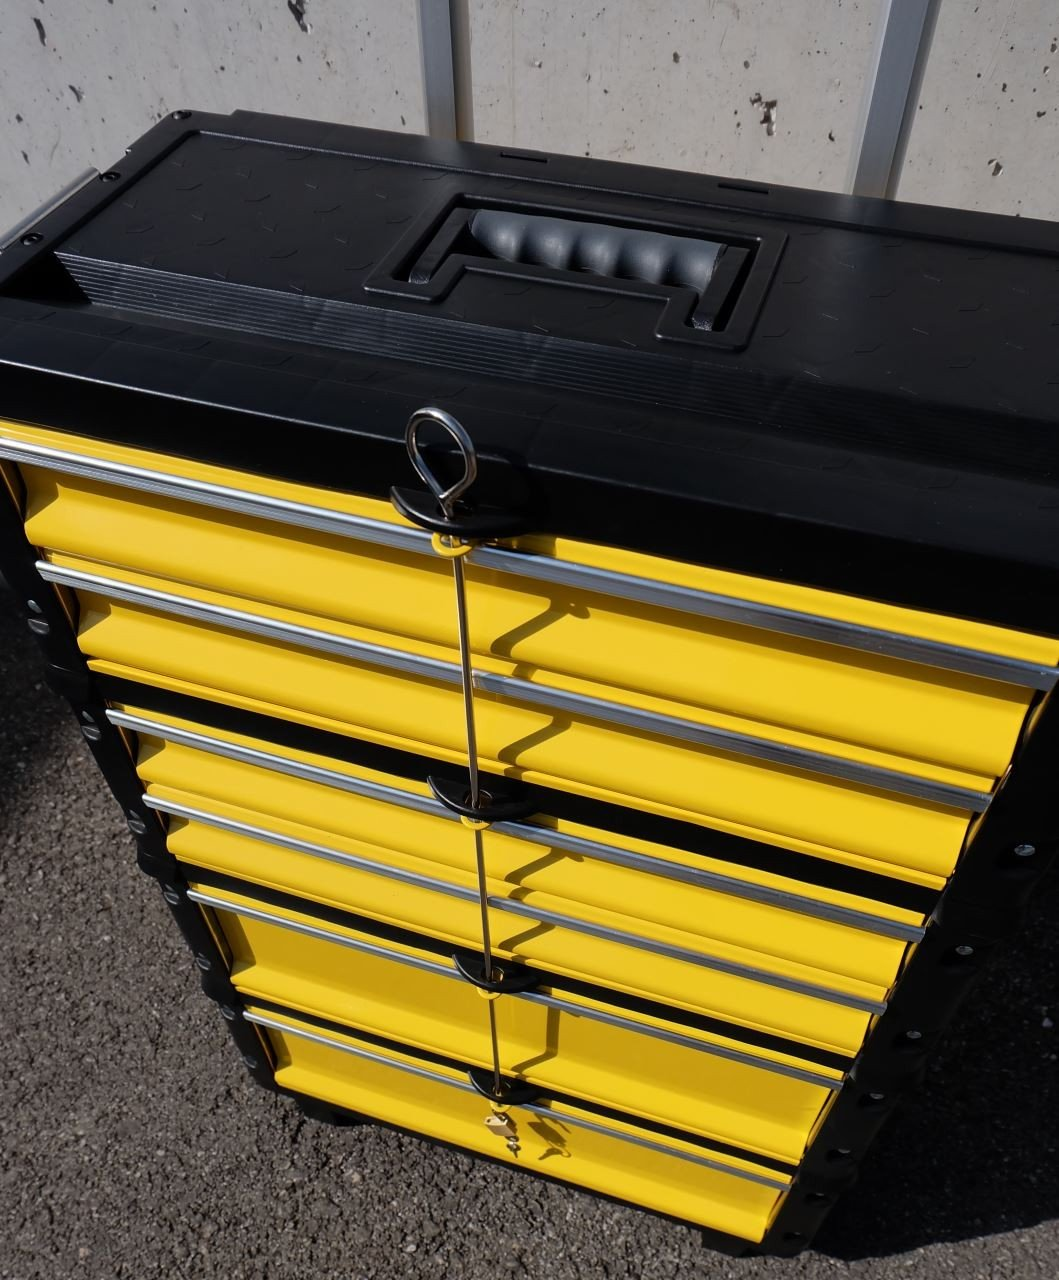 M/étal Outil Trolley XXL serie type 305 avec verroillage du tiroir et serrure de AS-S Farbe:Schwarz